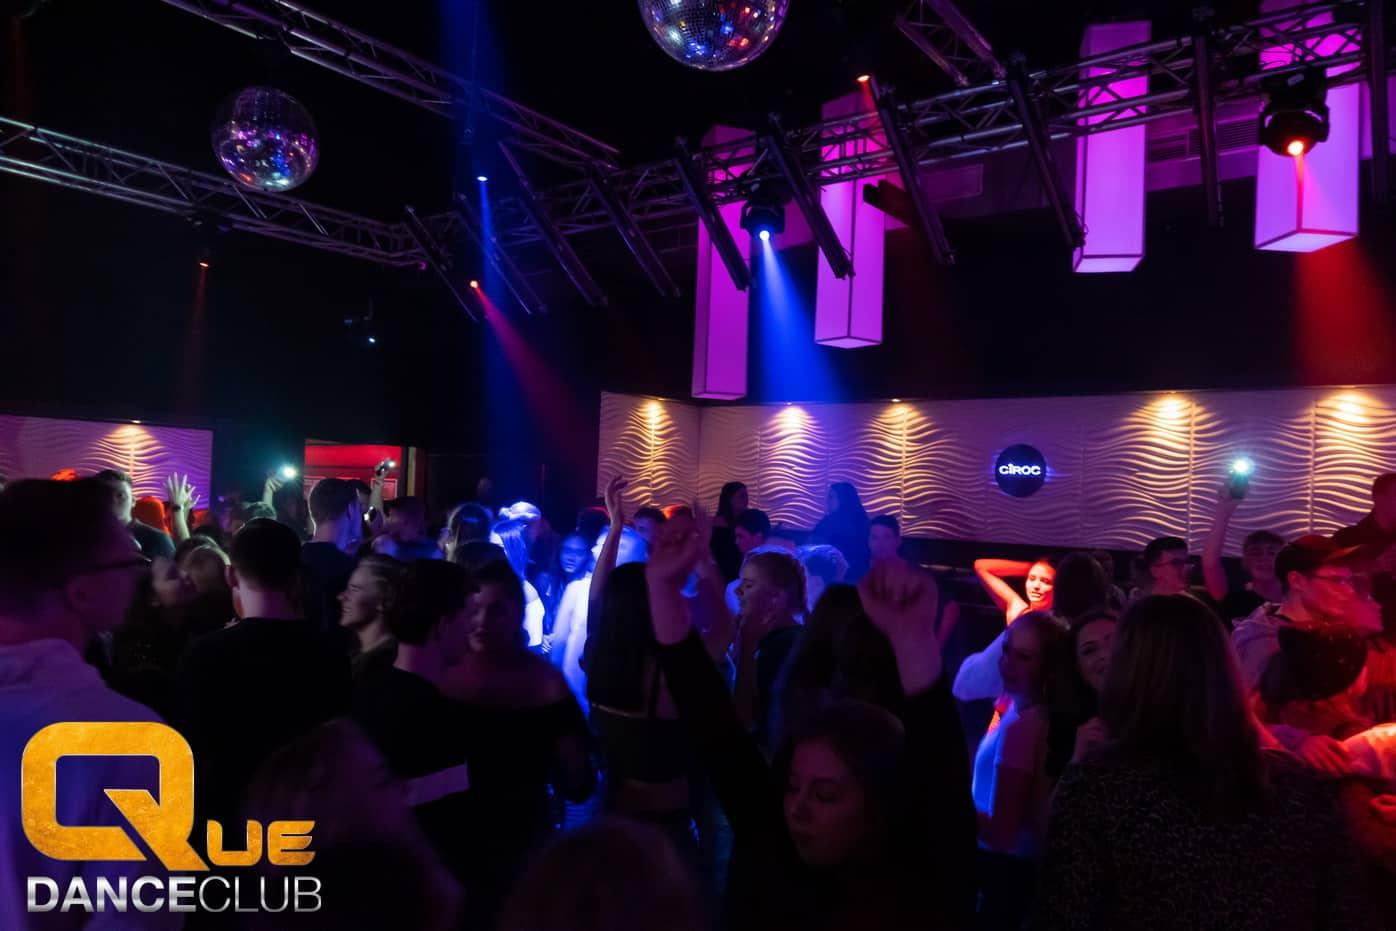 2018_12_20_Que_Danceclub_XMAS_Abiparty_United_Nightlife_Scene_Timo_025